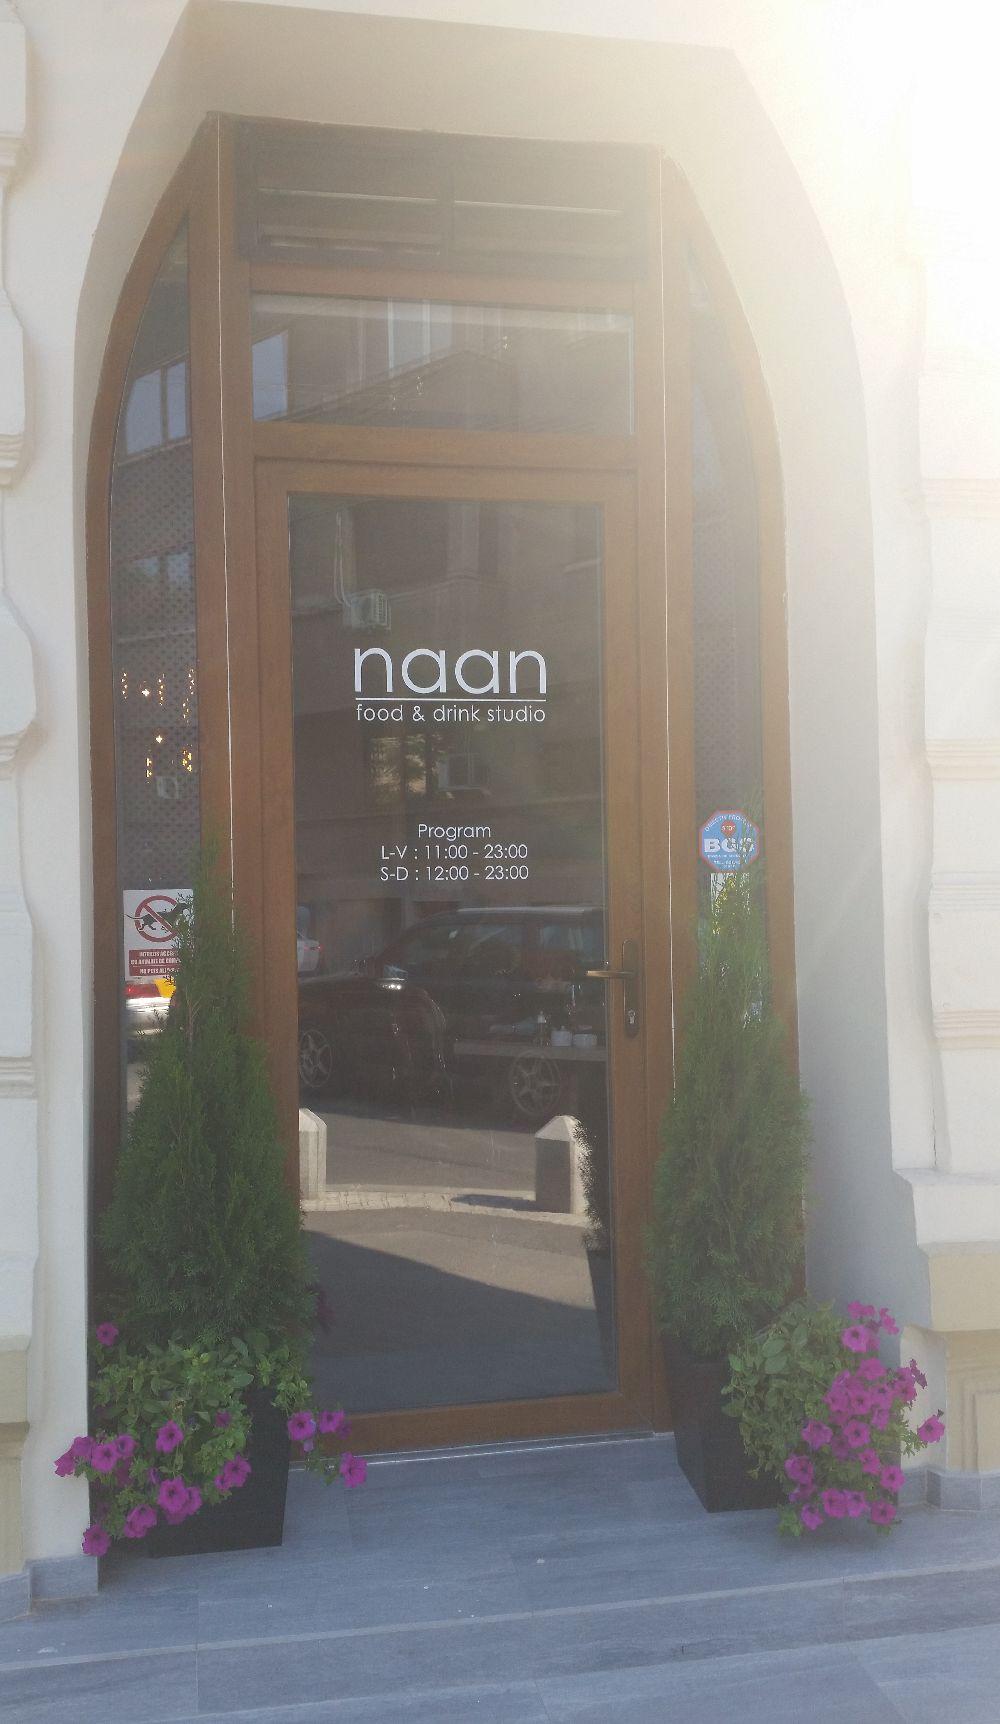 adelaparvu.com despre amenajare restaurant Naan, Bucuresti, design interior Delta Studio, Victor Grosu, Mihai Constantin, Iuliana Dinca (4)